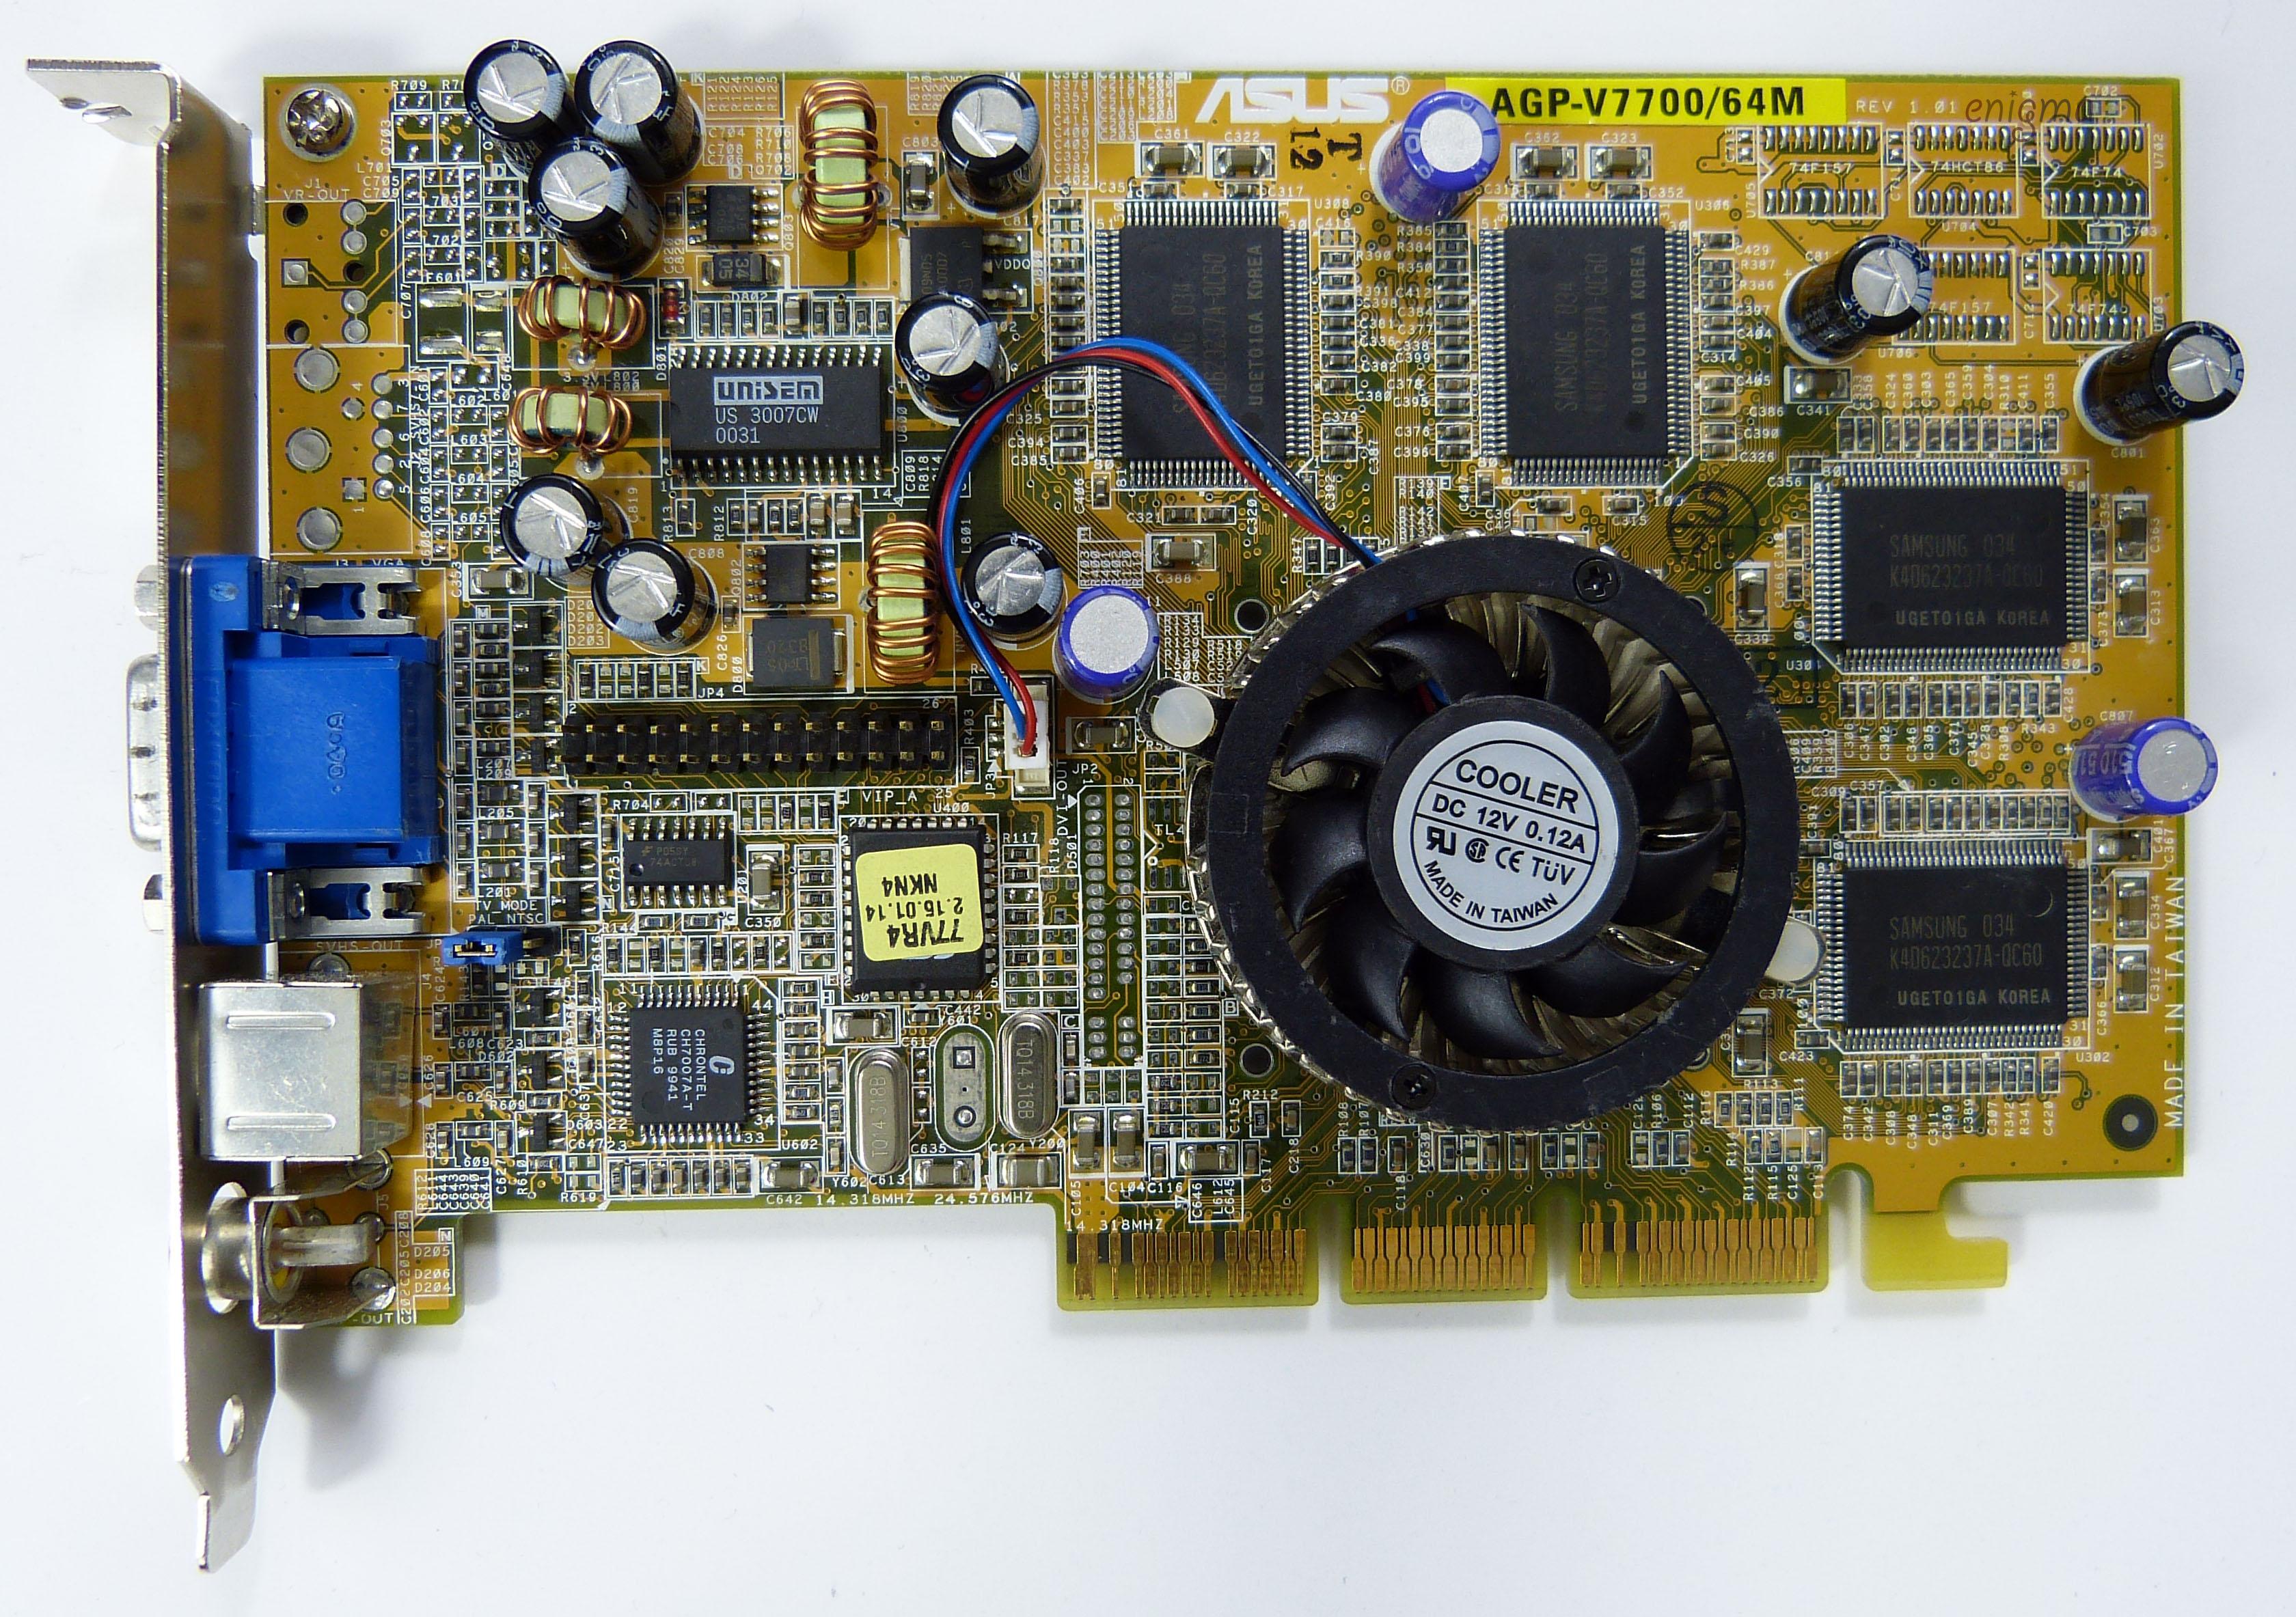 New Drivers: Asus AGP-V7700/64M